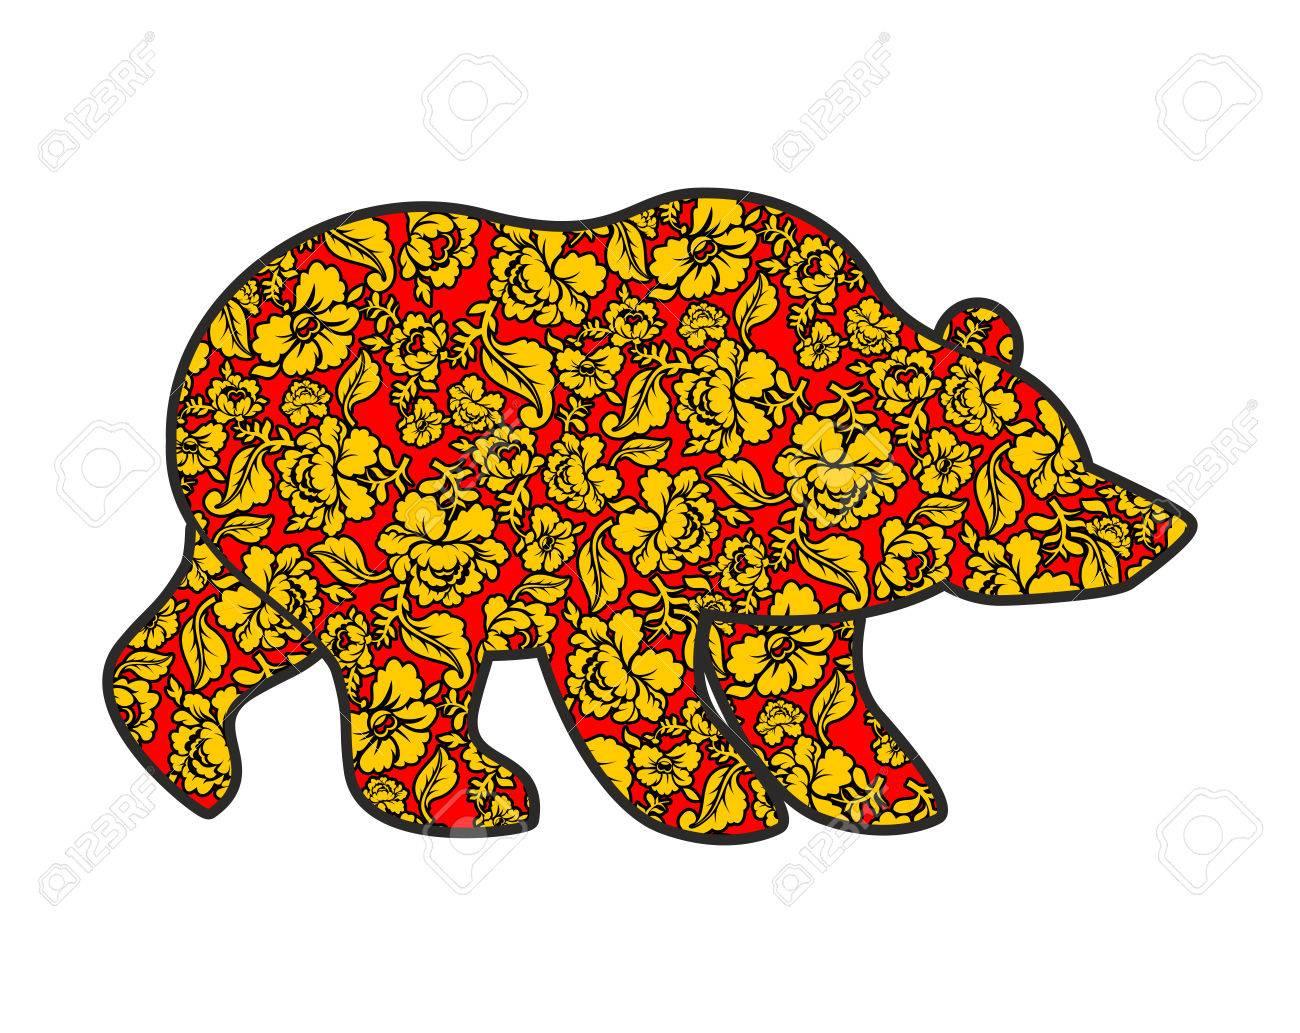 Russian Bear Hohloma Style National Folk Painting Of Flowers Wild